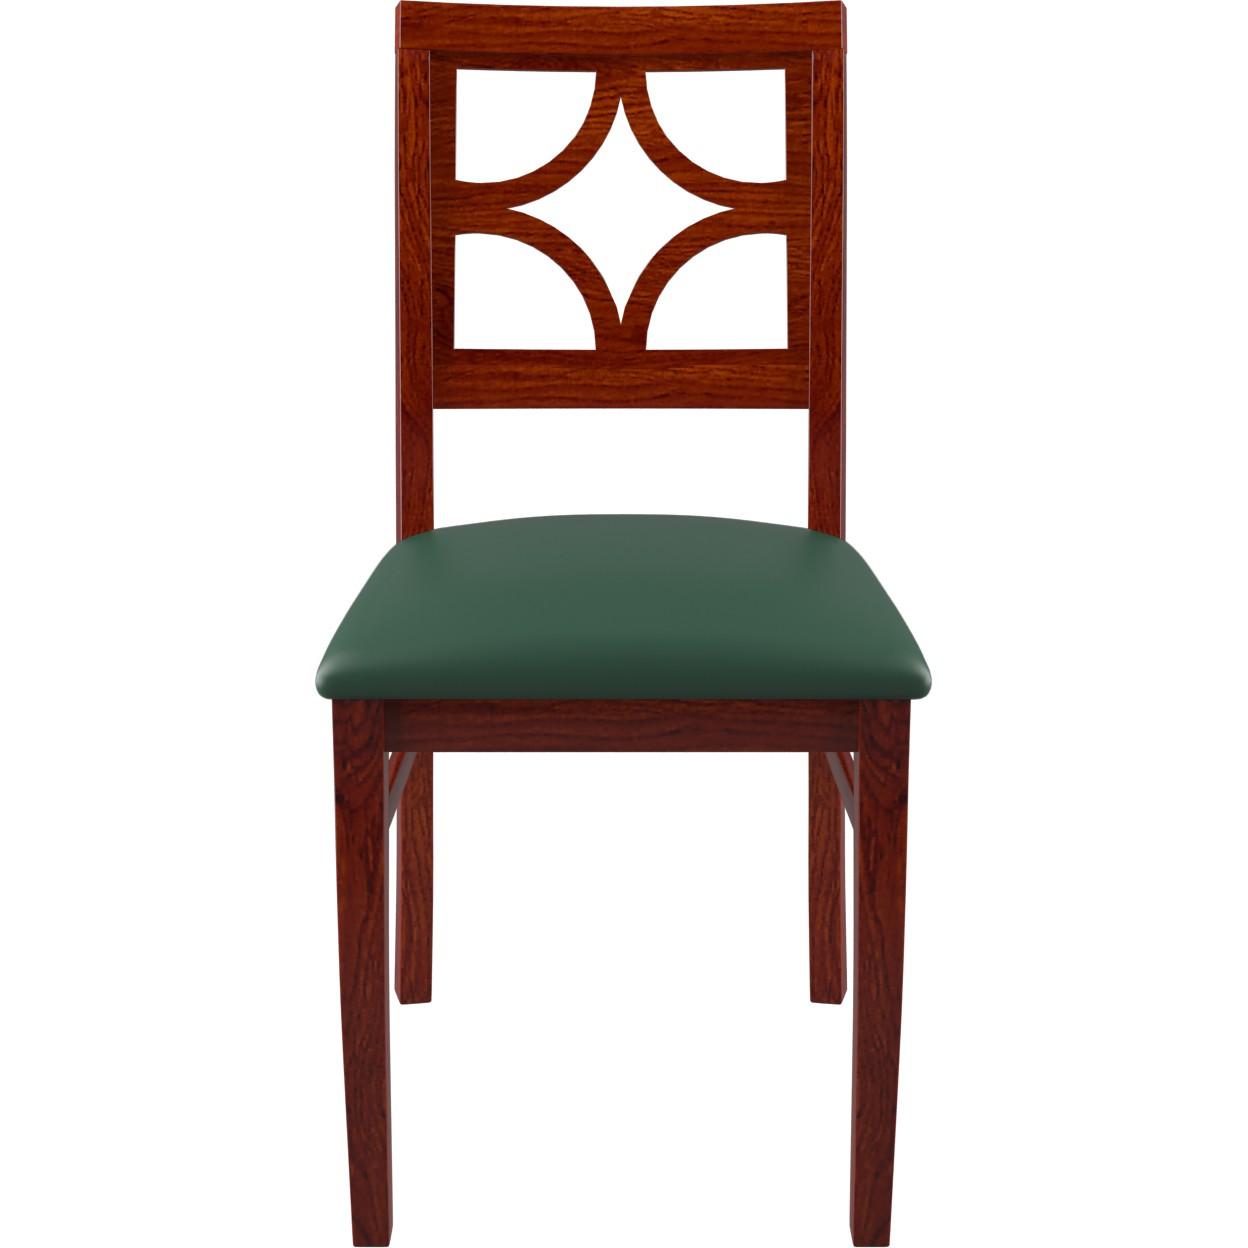 Designer Series Rio X Back Restaurant Wood Chair